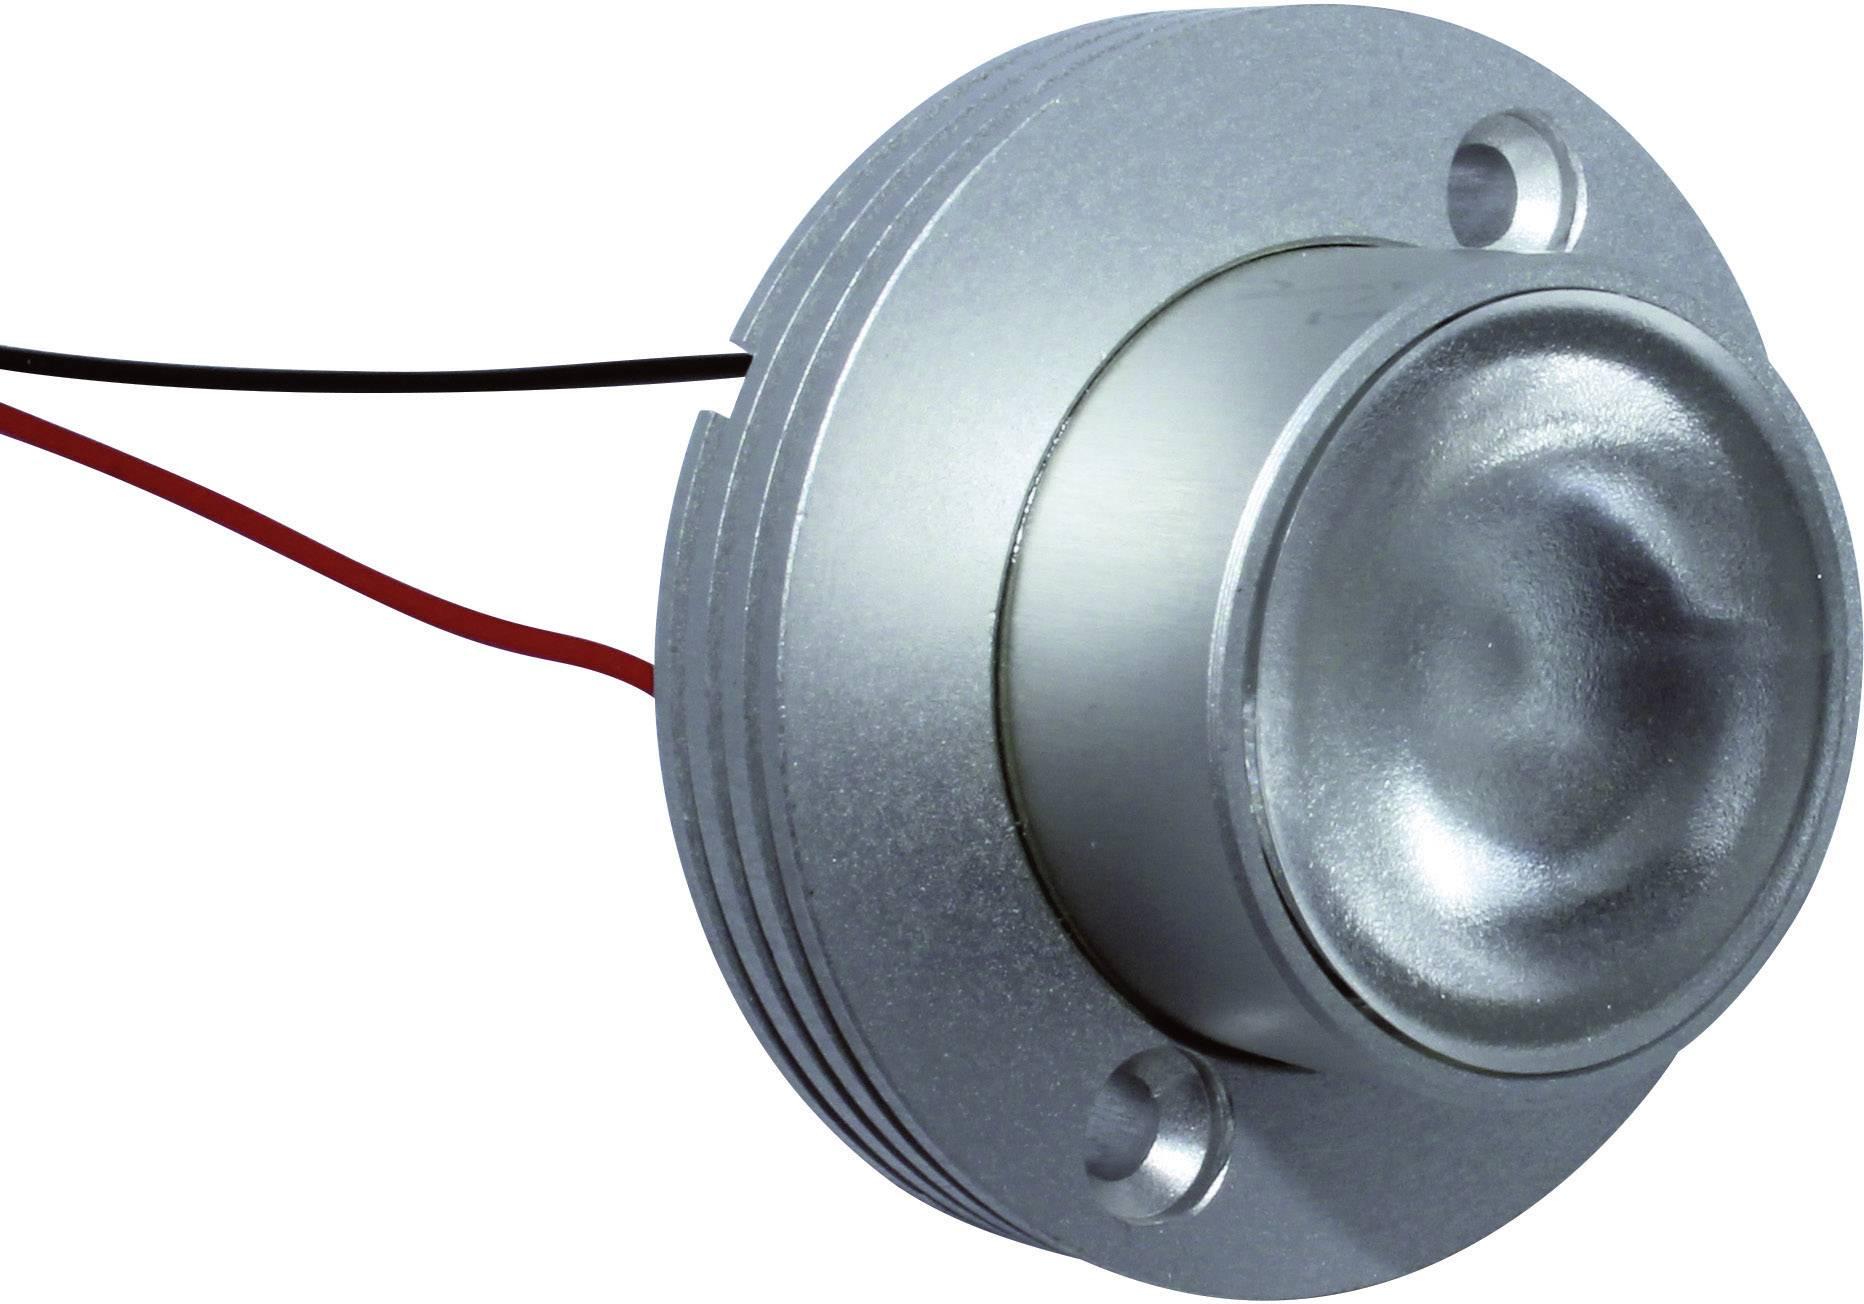 HighPower LED-spot Signal Construct QAUR1161L030, 15 °, 140 lm, 1 W, 3.3 V, biela